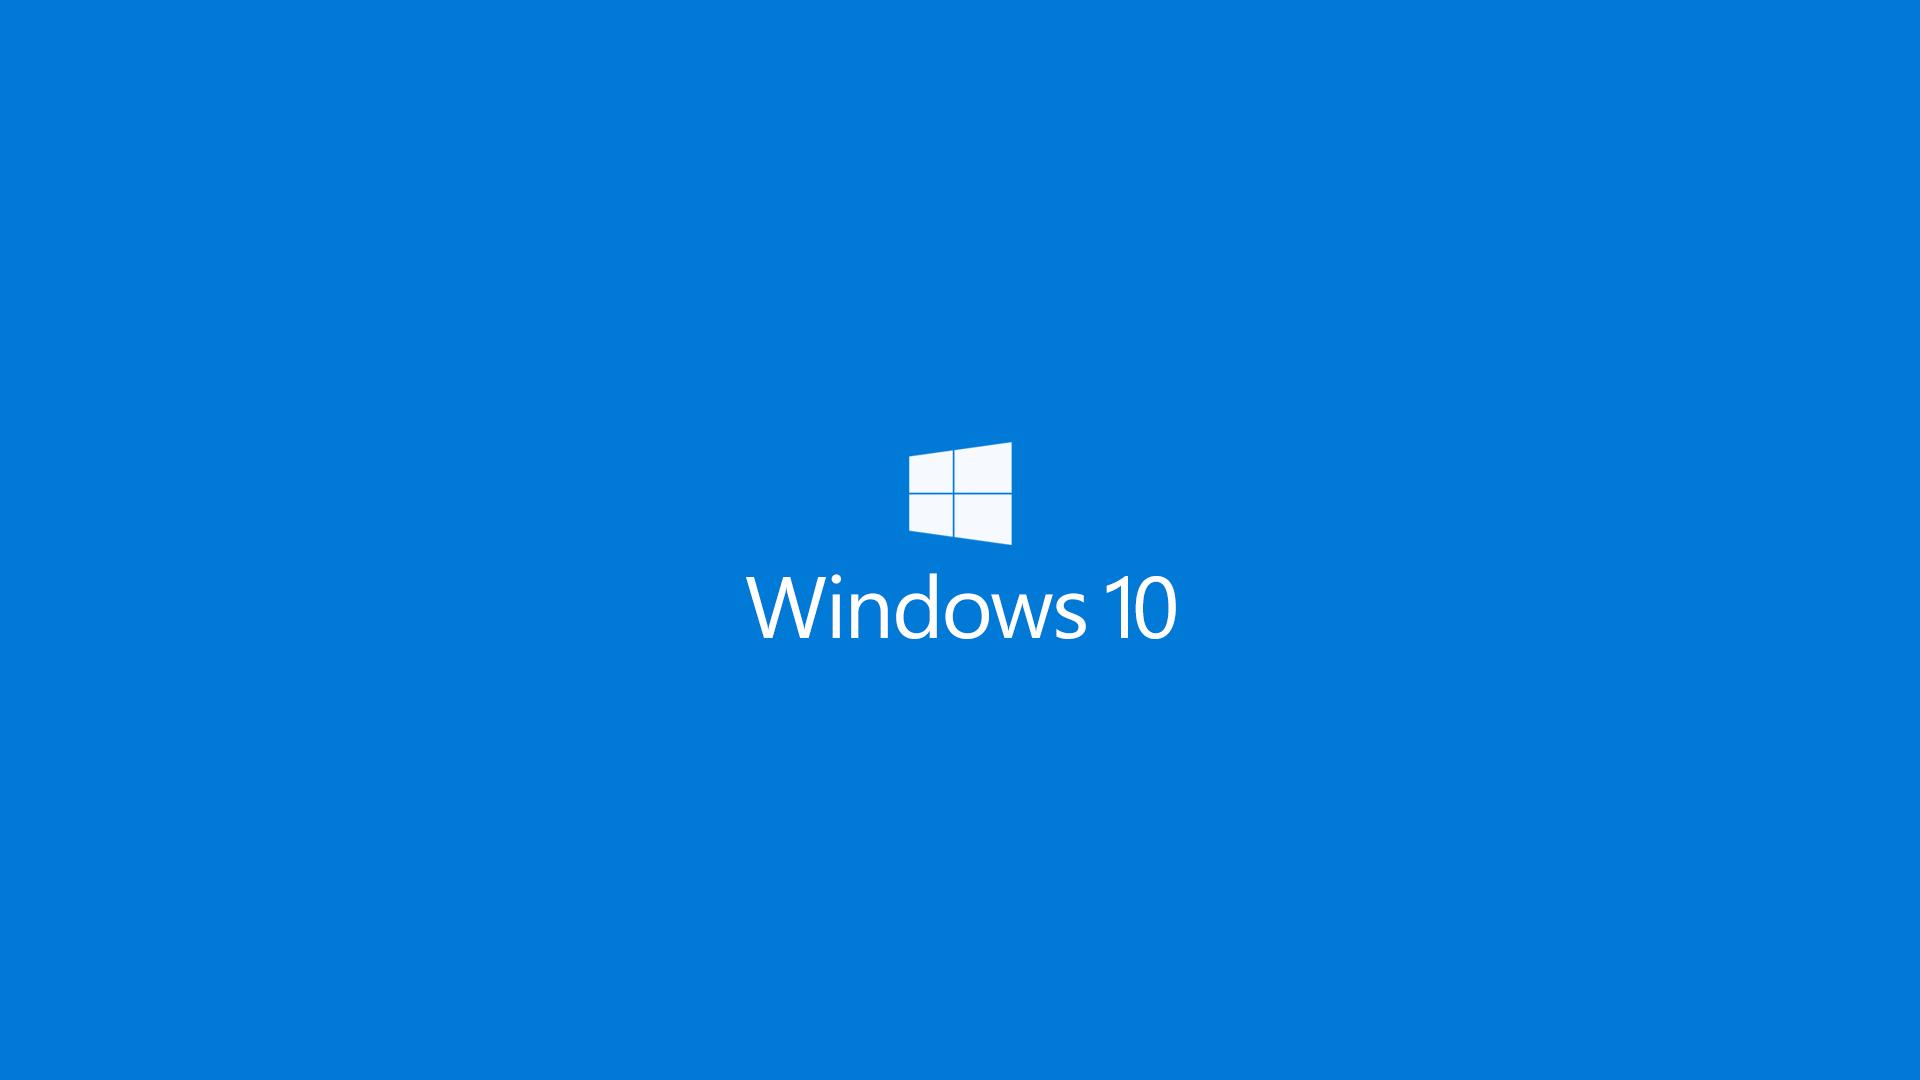 Windows 10 Blue Background Desktop Background - Windows 7 - HD Wallpaper